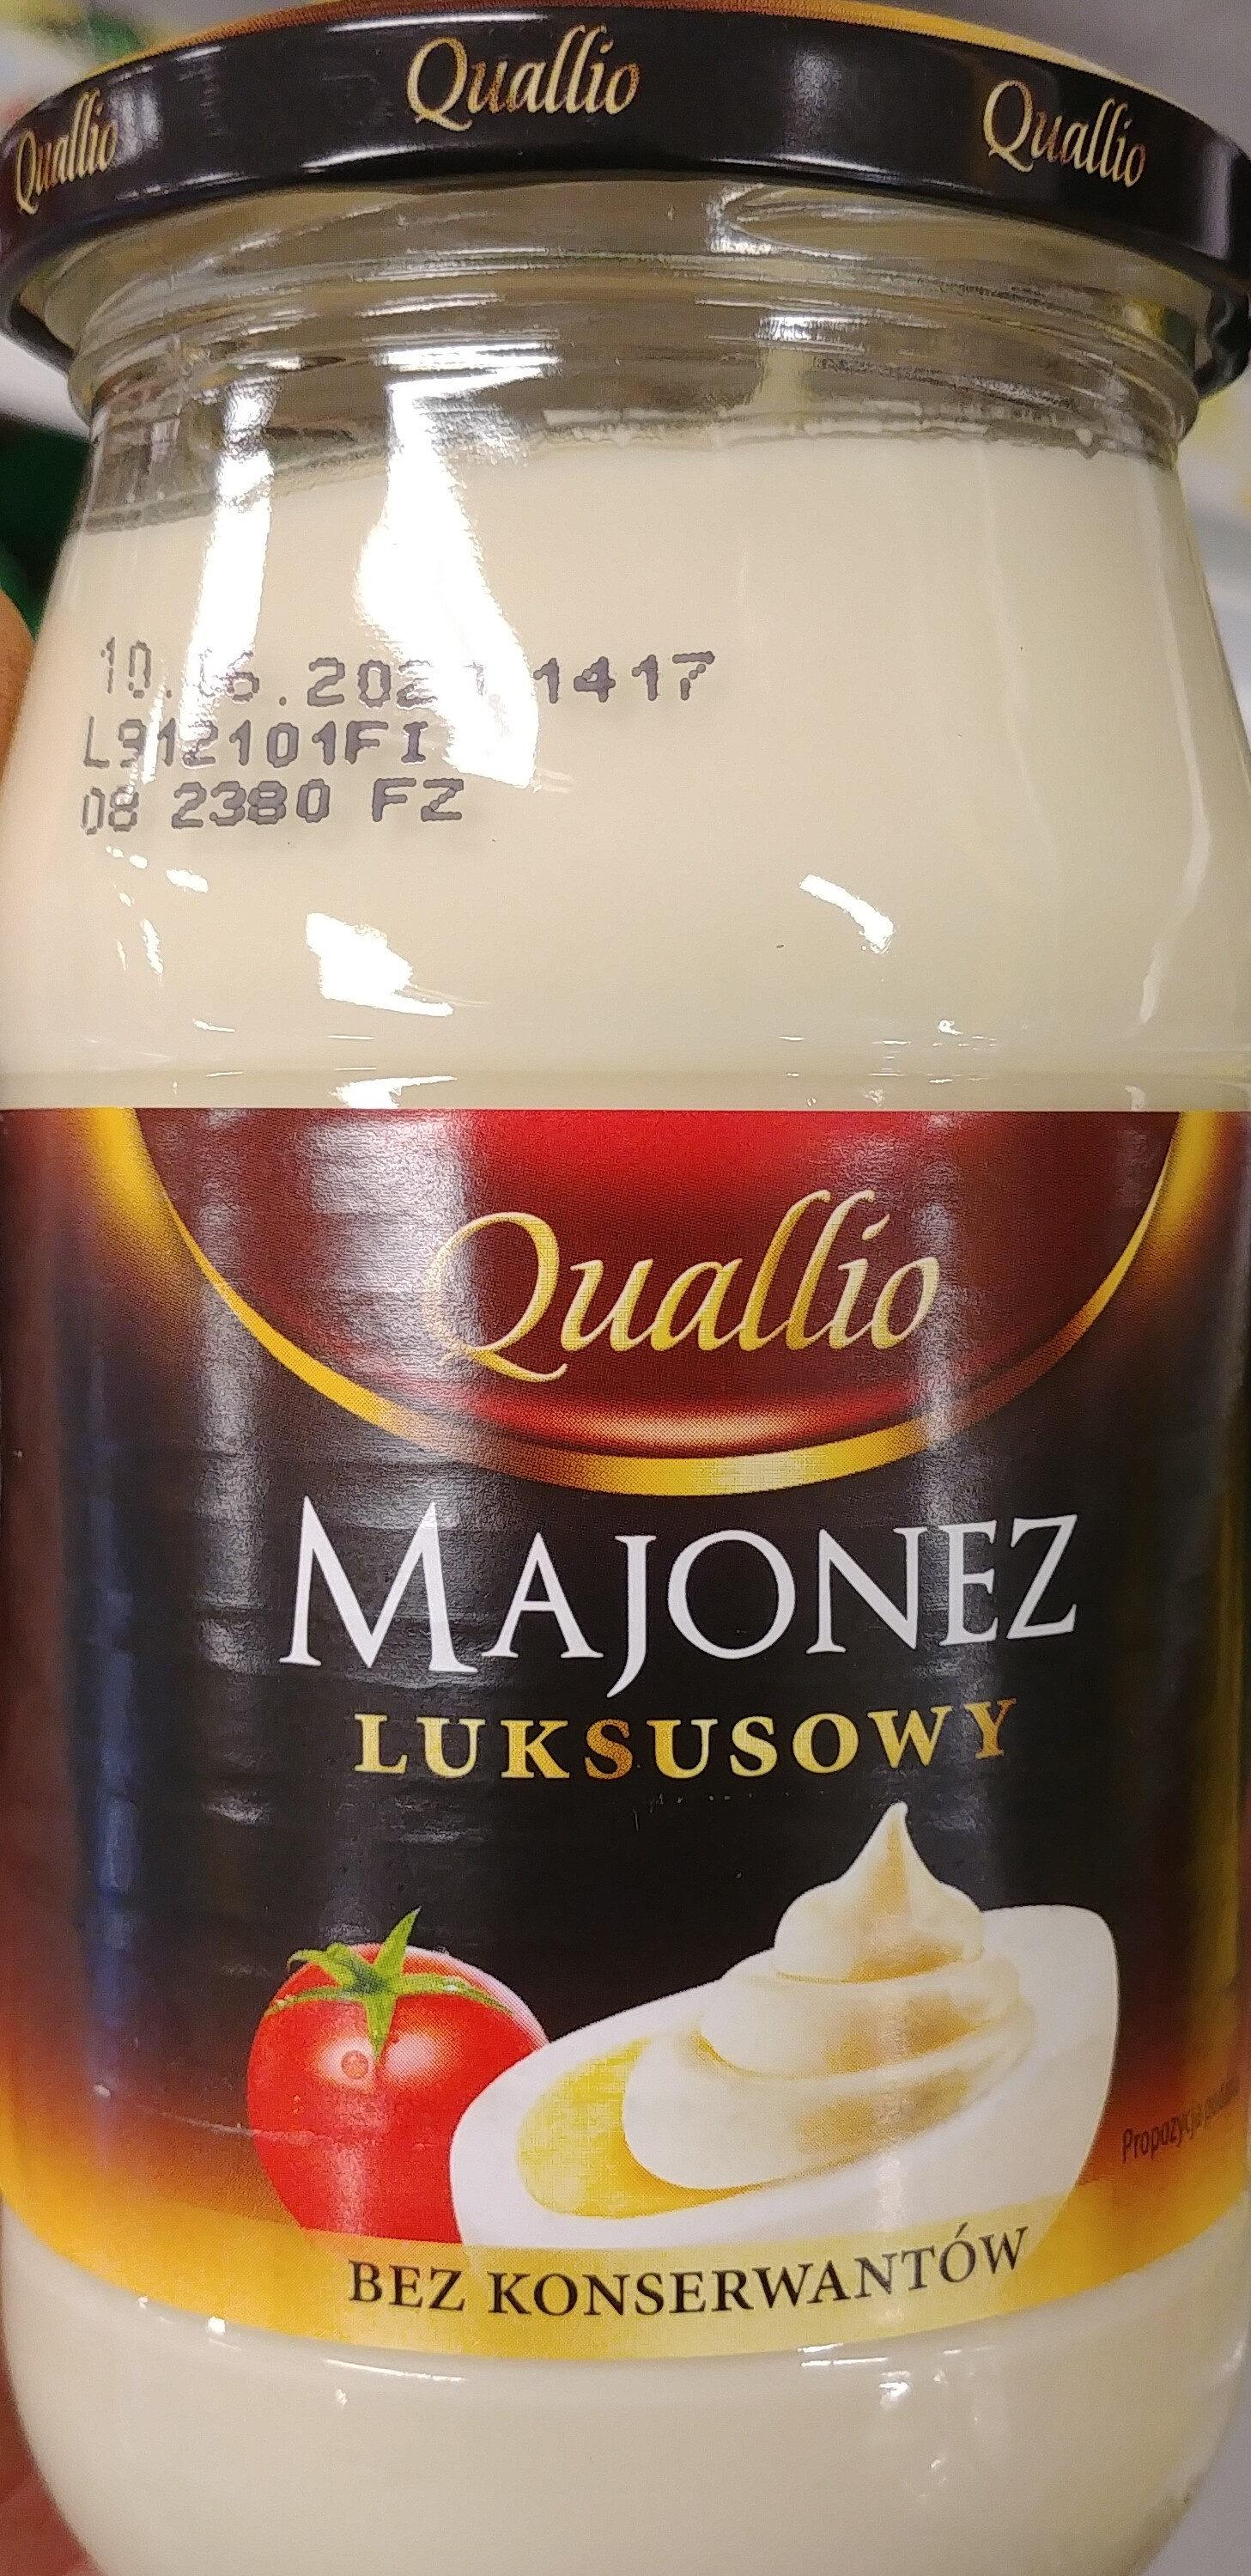 Majonez - Produkt - pl